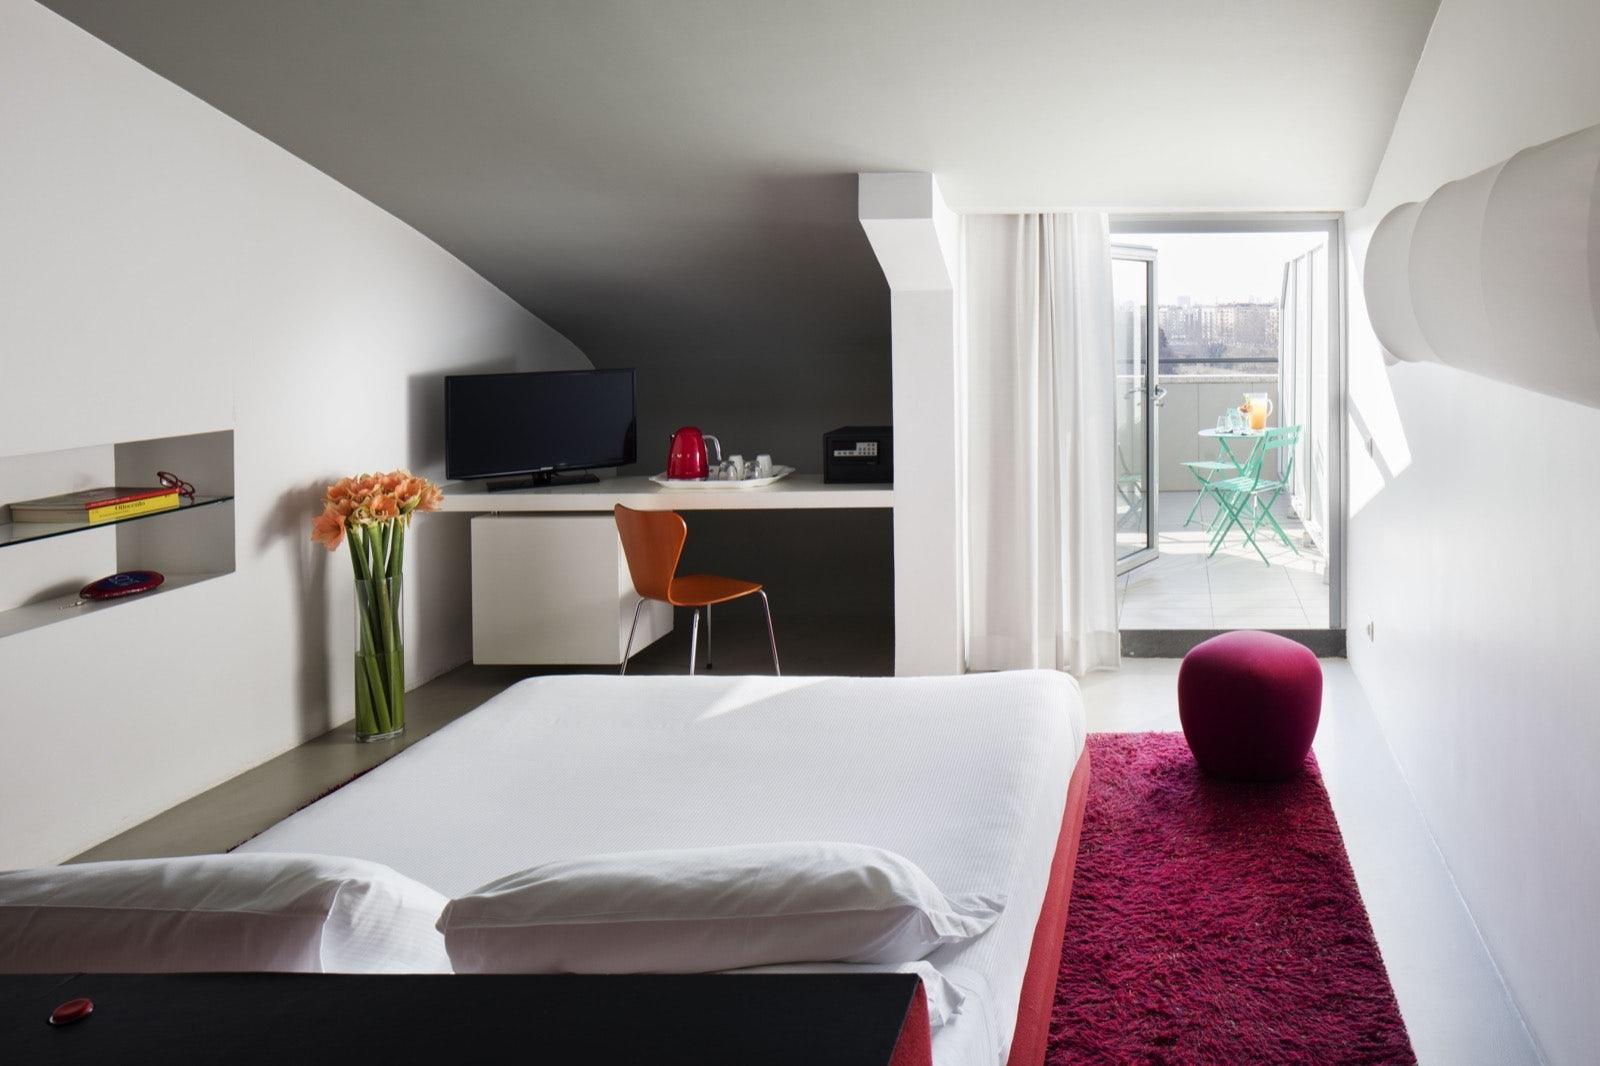 interior at Worldhotel Ripa